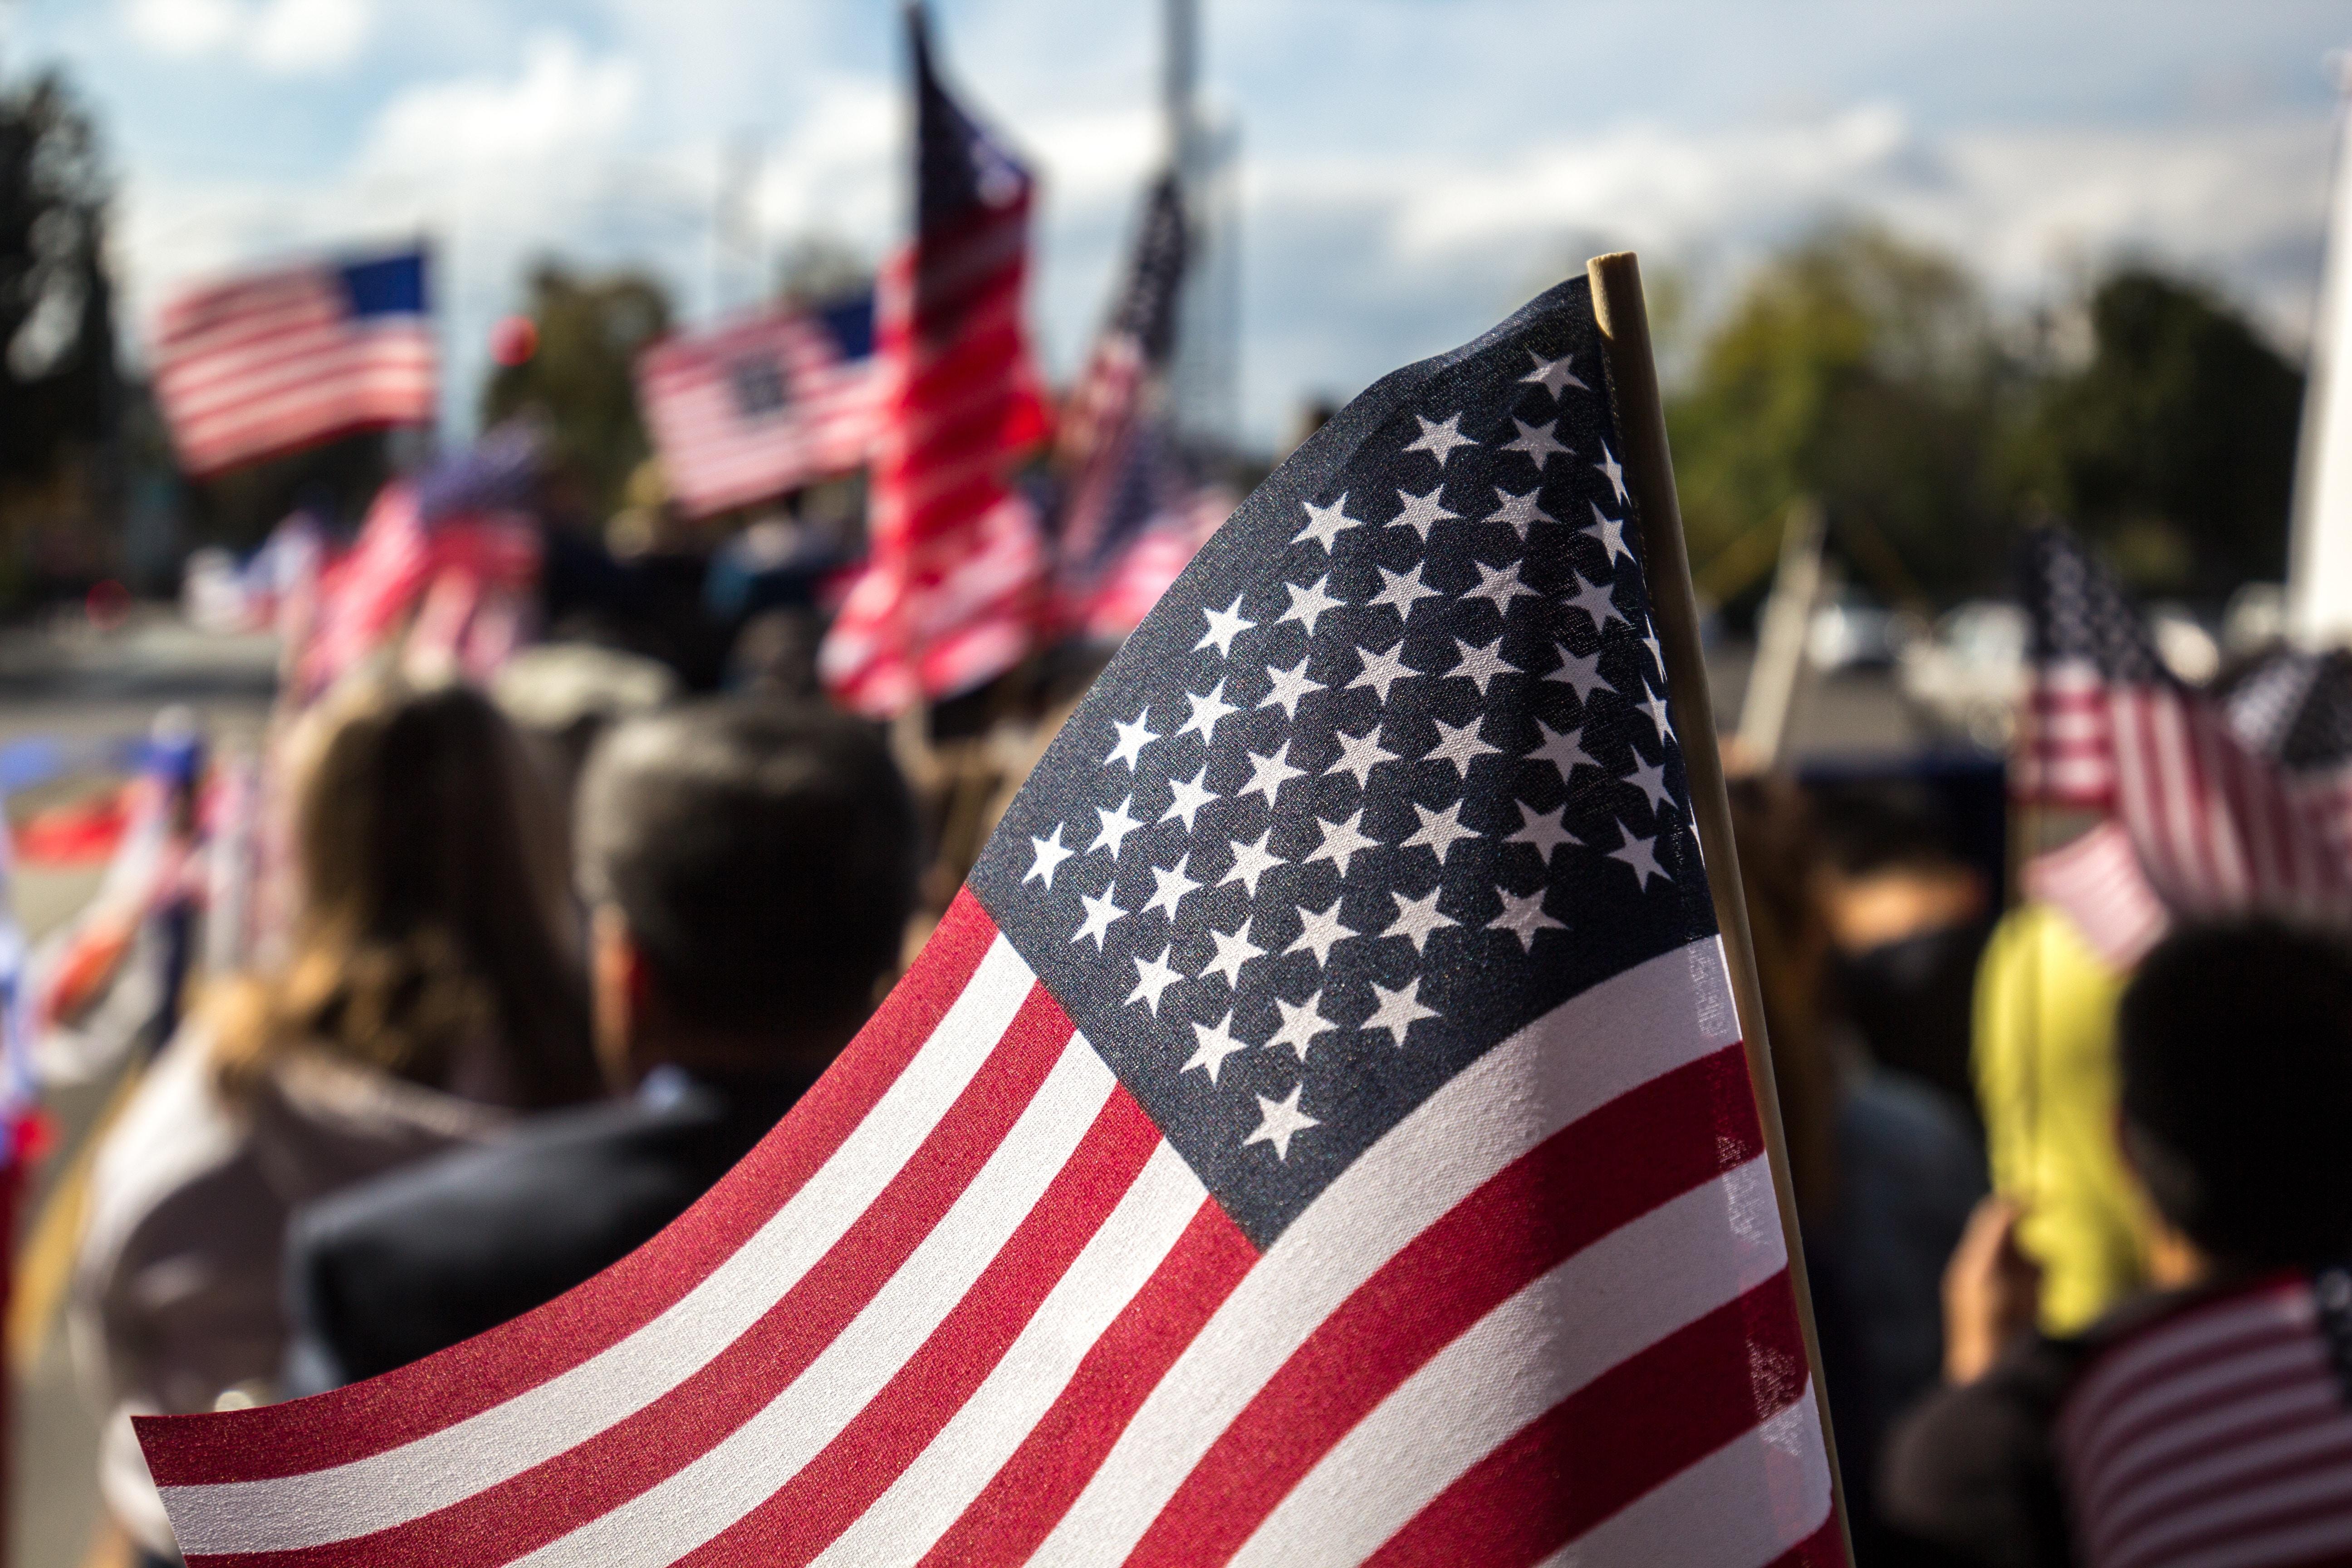 USA flag with rod